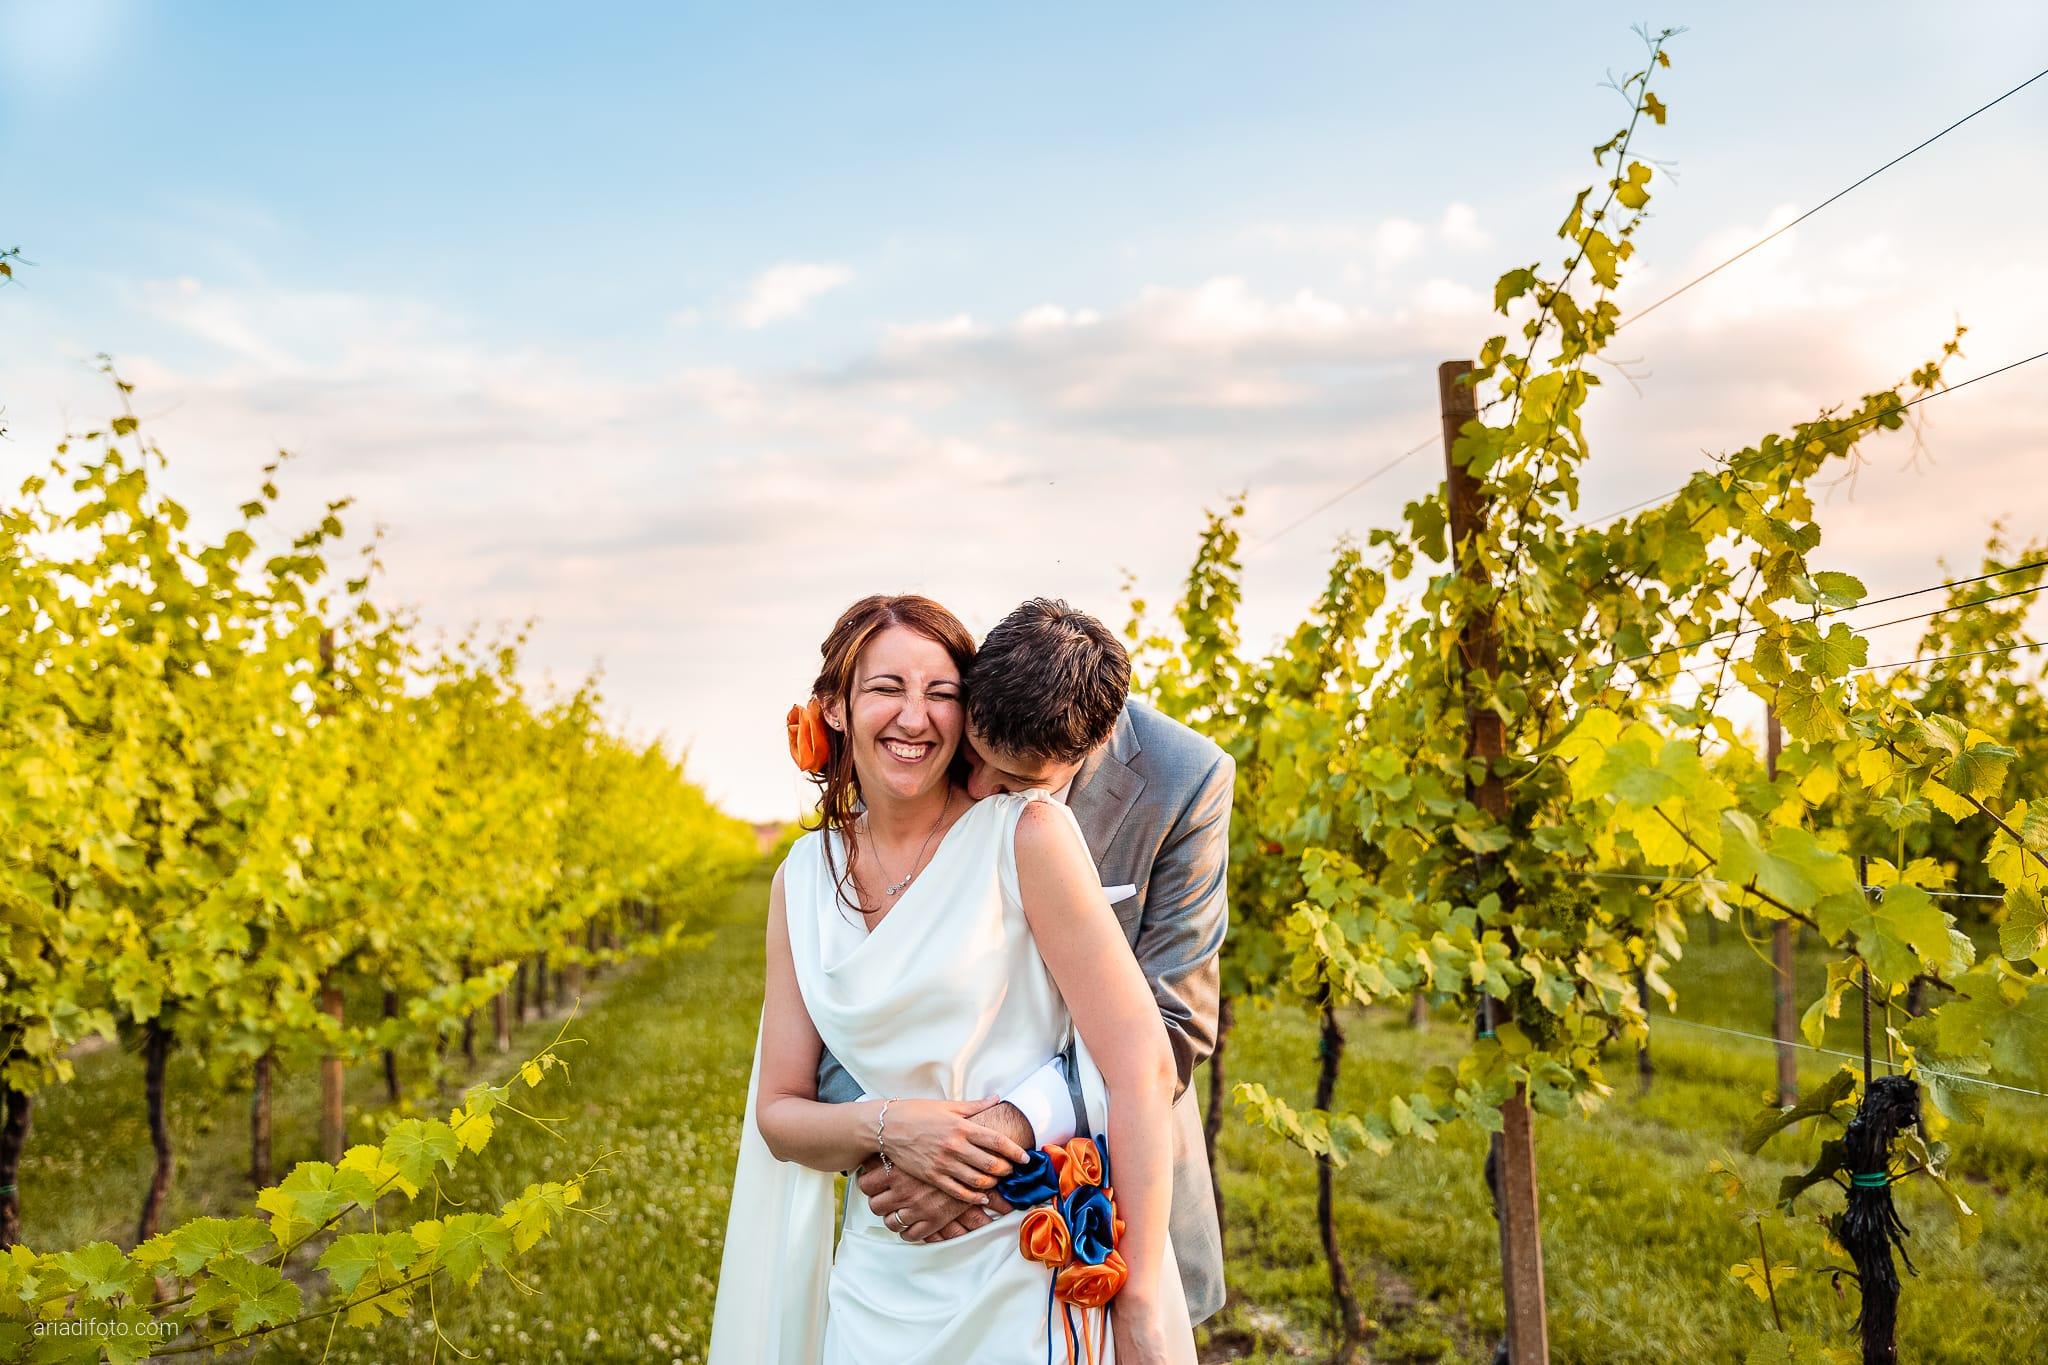 Elisa Diego matrimonio Villa Revoltella Trieste Paradiso Pocenia Udine ritratti sposi vitigni